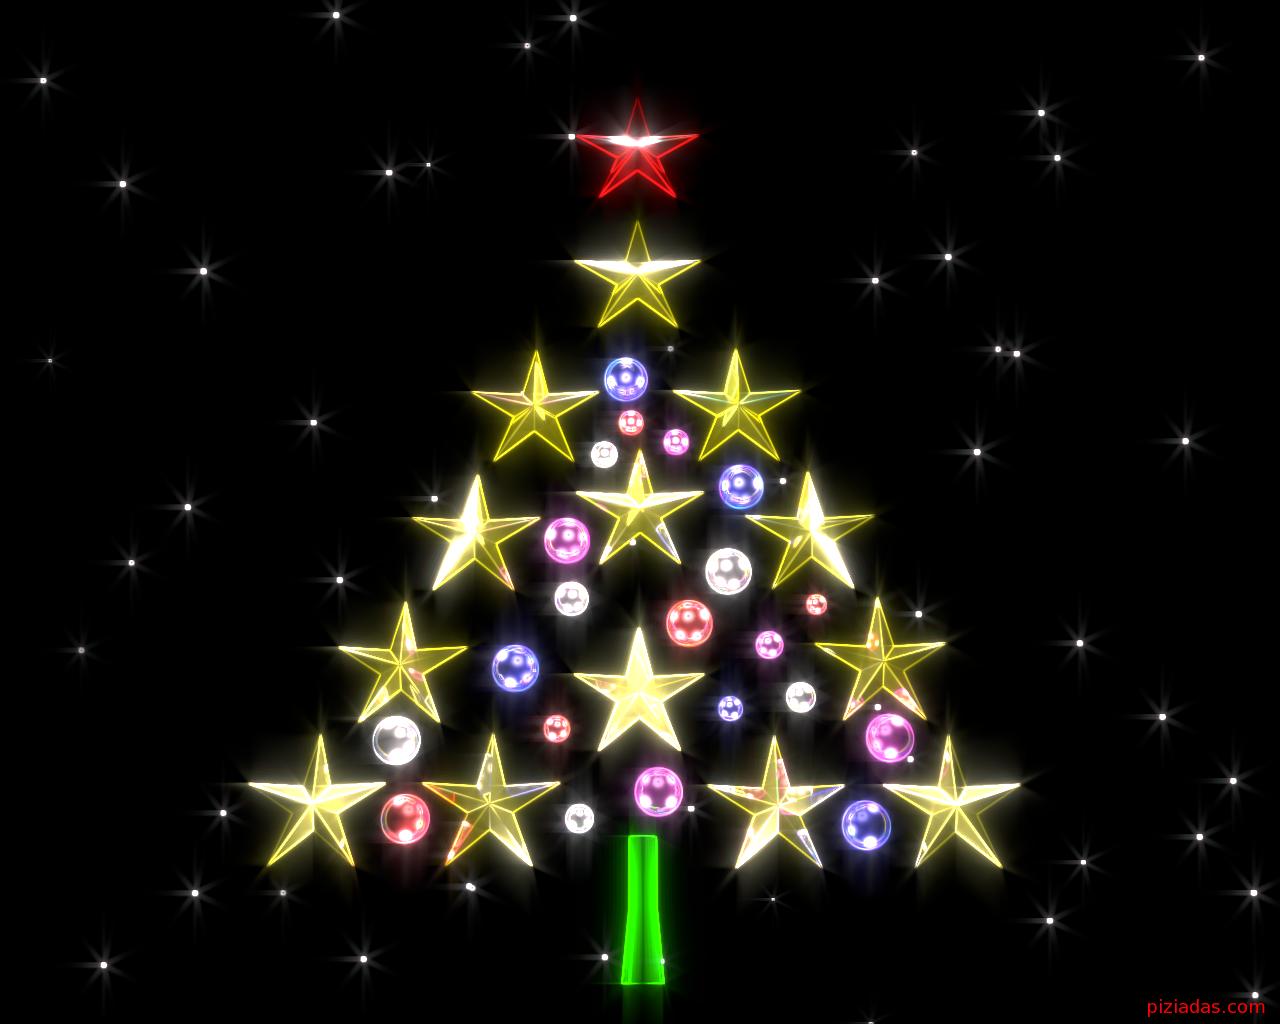 2011 xiii imagen 1280 1024 for Fotos arbol navidad